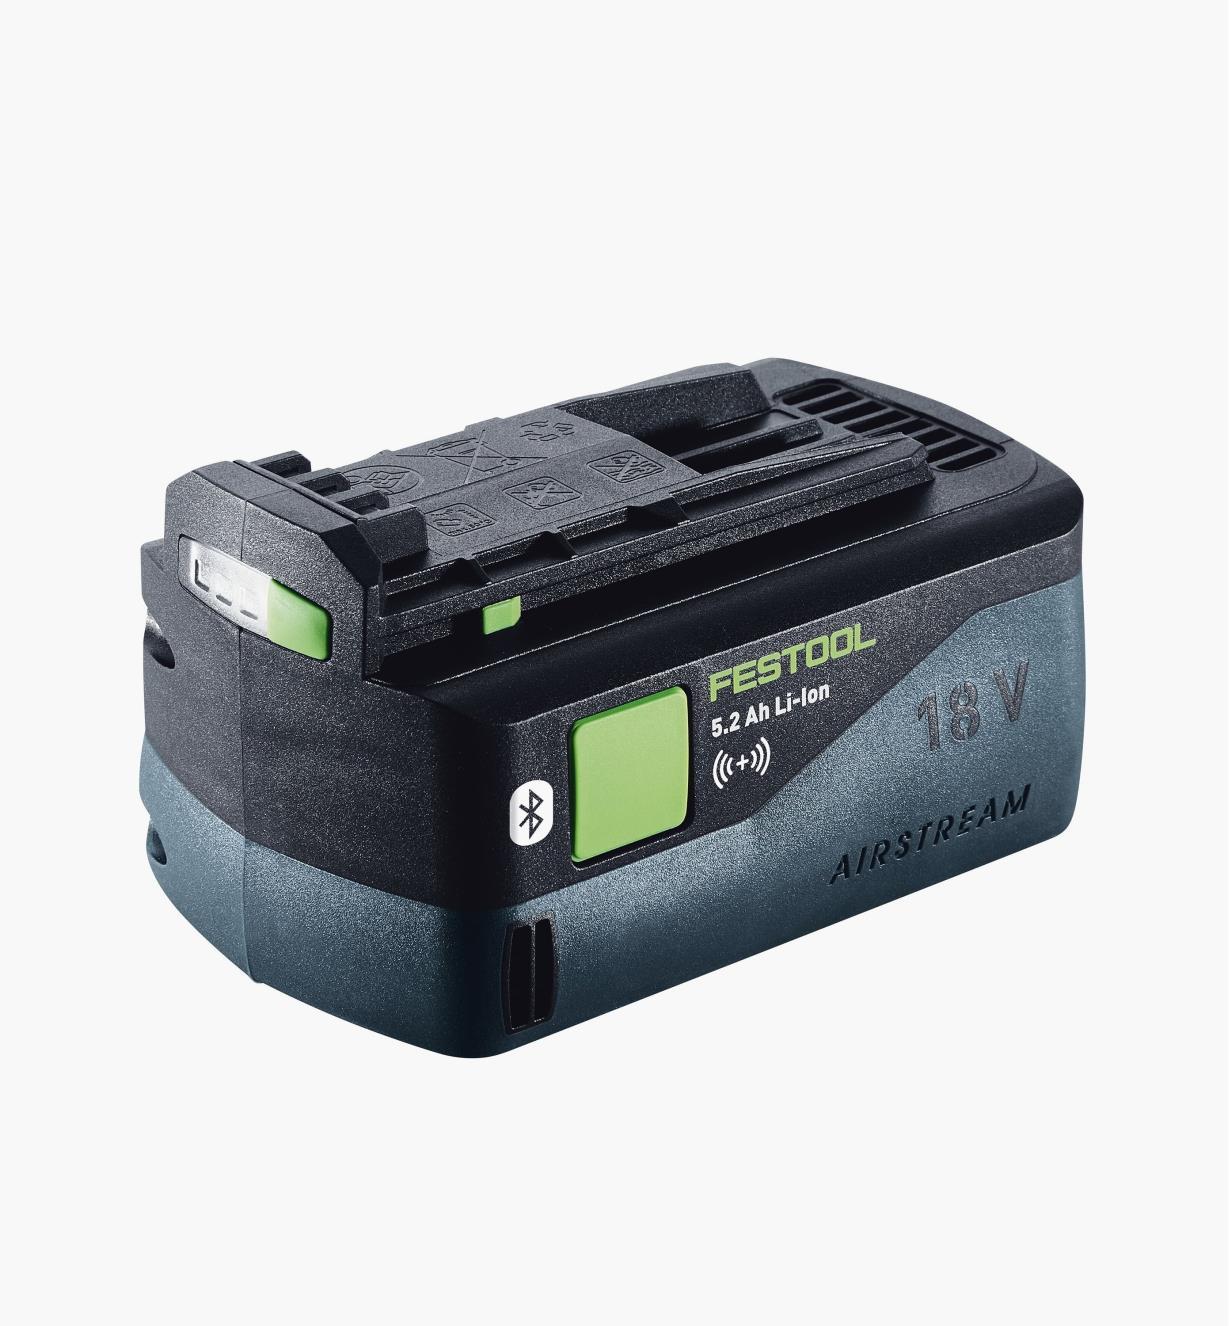 Battery Pack Li 5.2